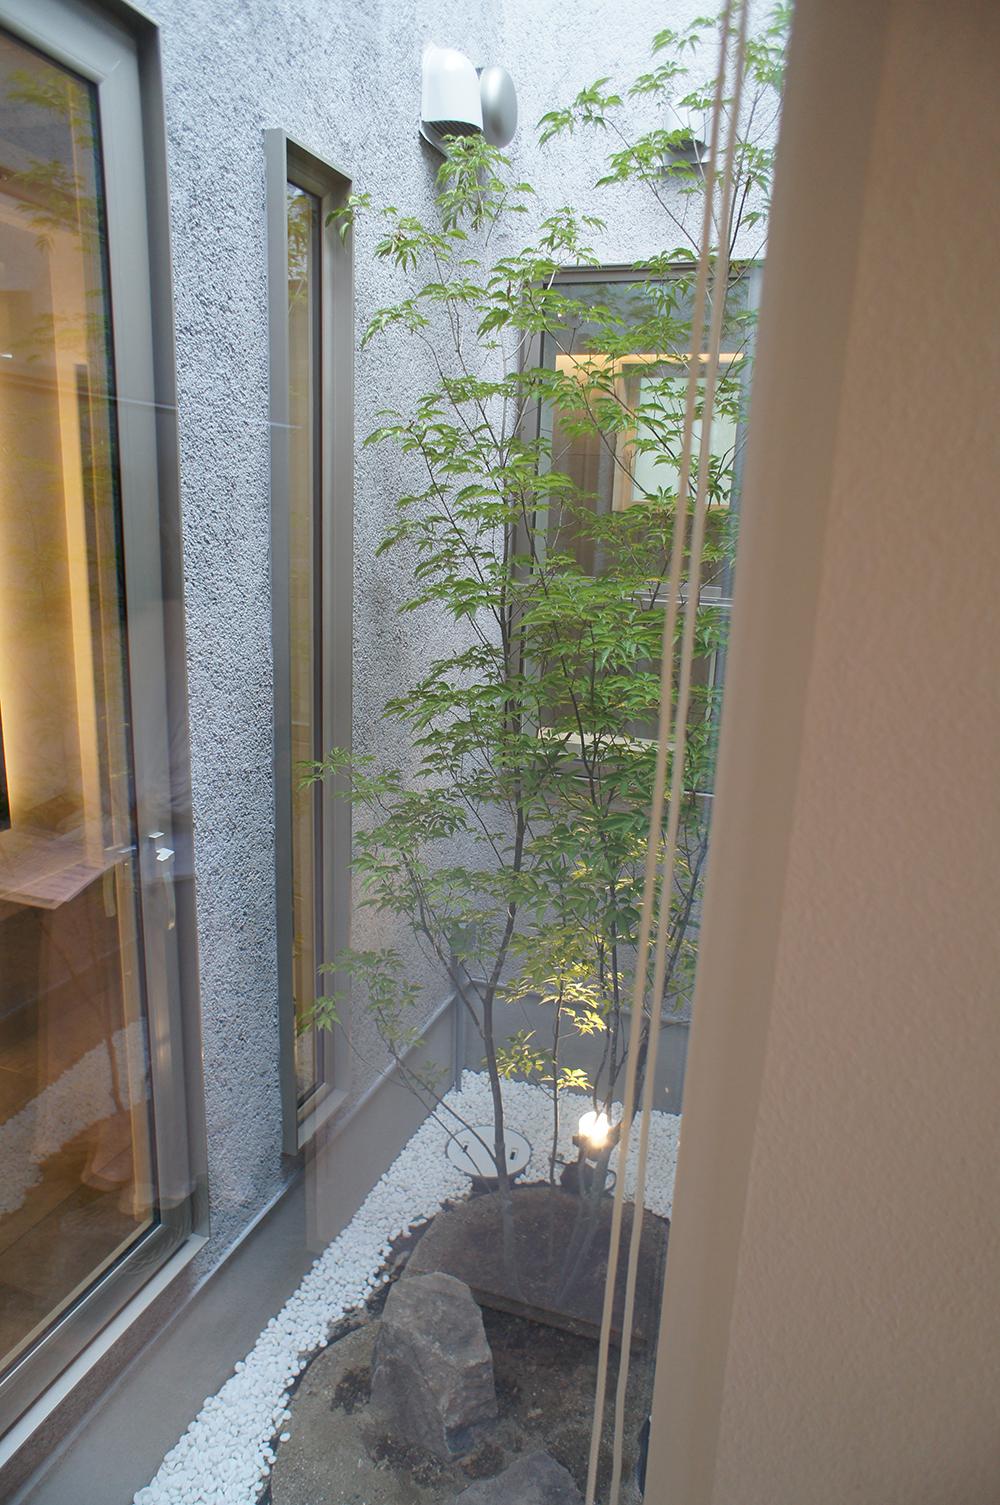 注文住宅 新築 姫路市 ADHOUSE お風呂 眺め 坪庭 在来風呂